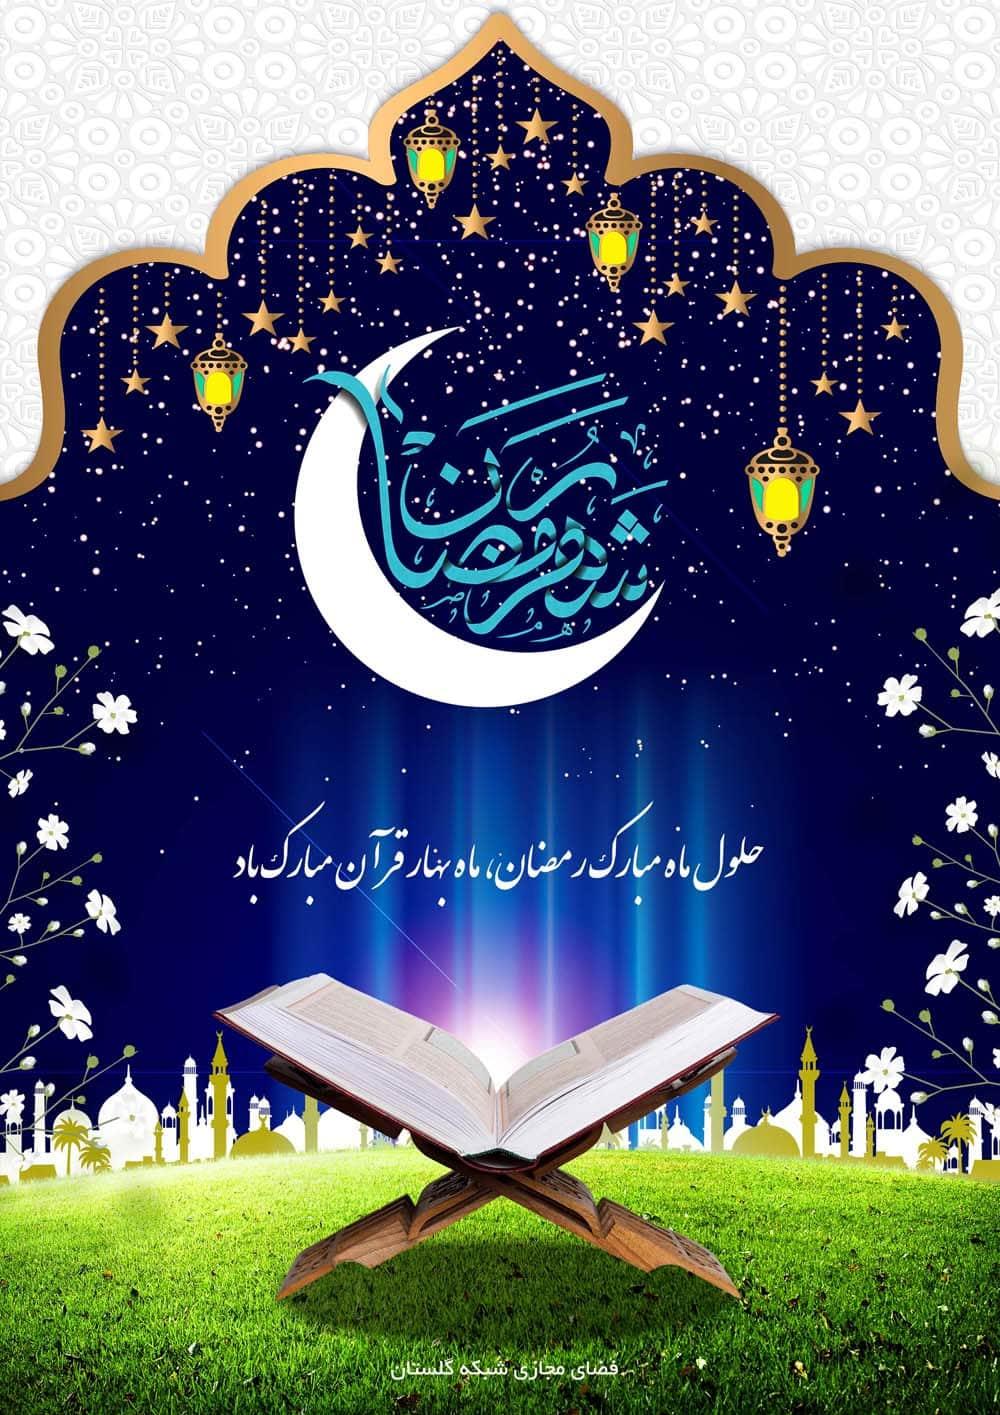 about mahe ramaza 3 - همه چیز درباره ماه رمضان